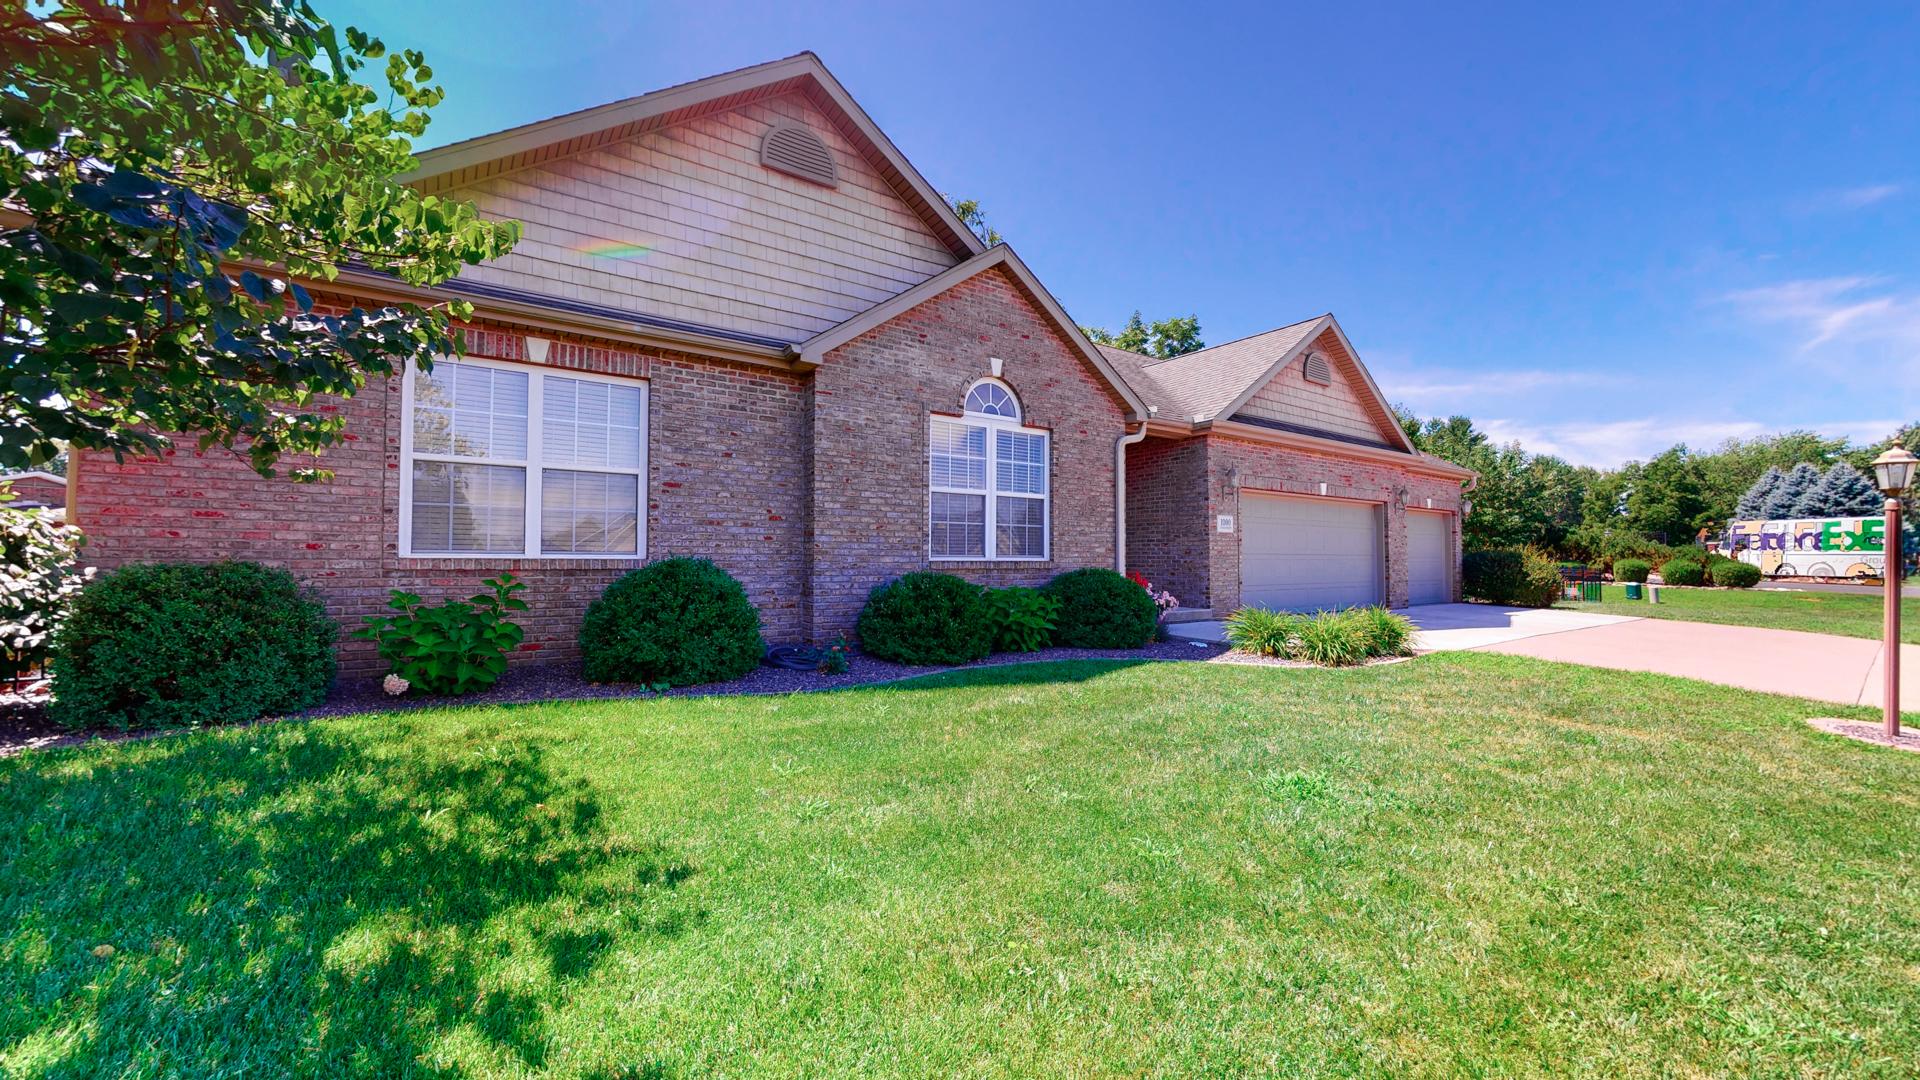 1000 Thornberry ,Germantown Hills, Illinois 61548